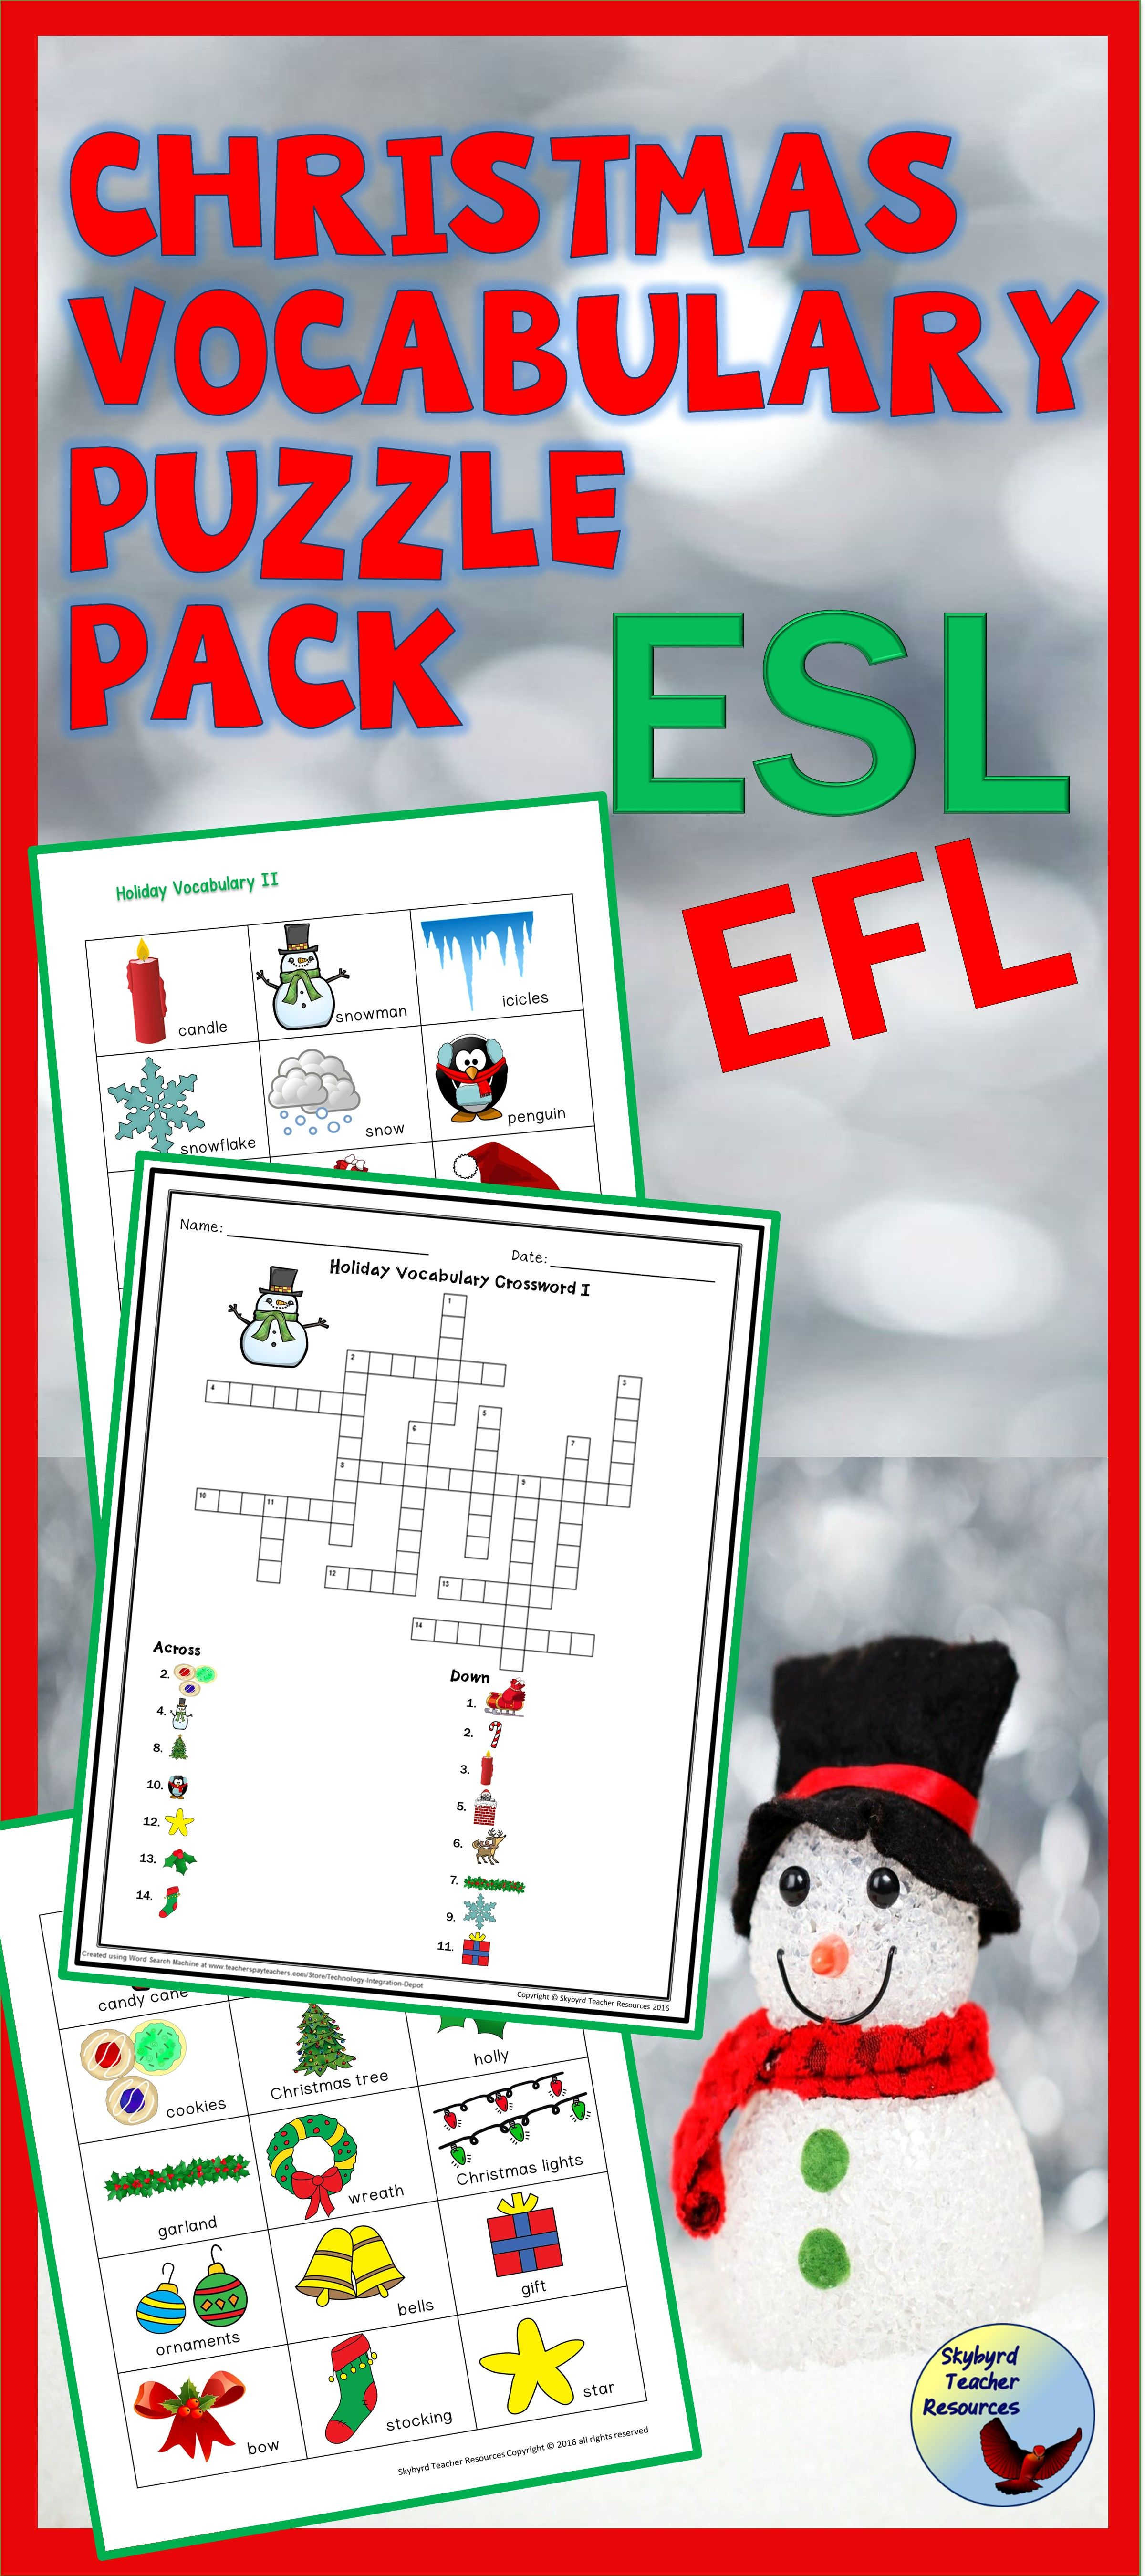 Christmas Vocabulary Puzzle Pack ESL ENL EFL Newcomer Intermediate ...